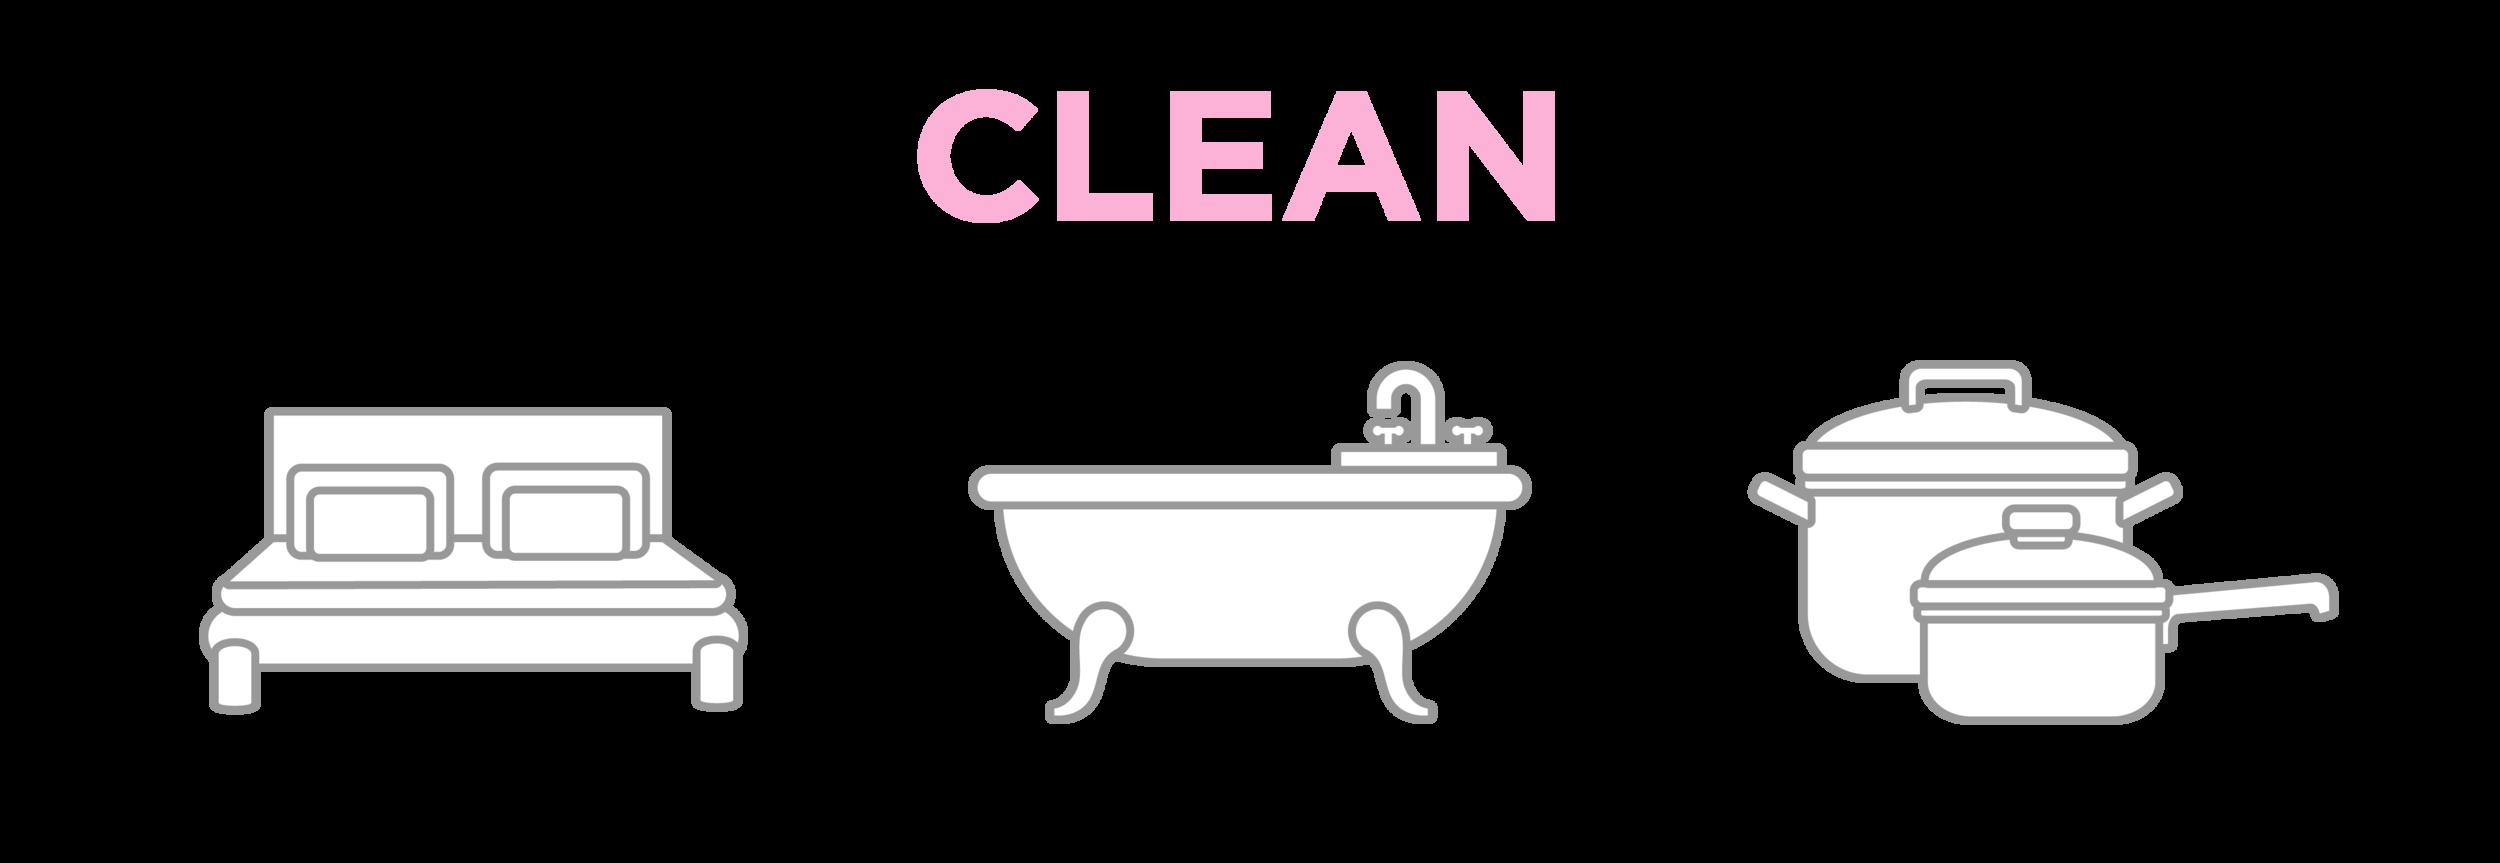 APE_Services_Clean.png